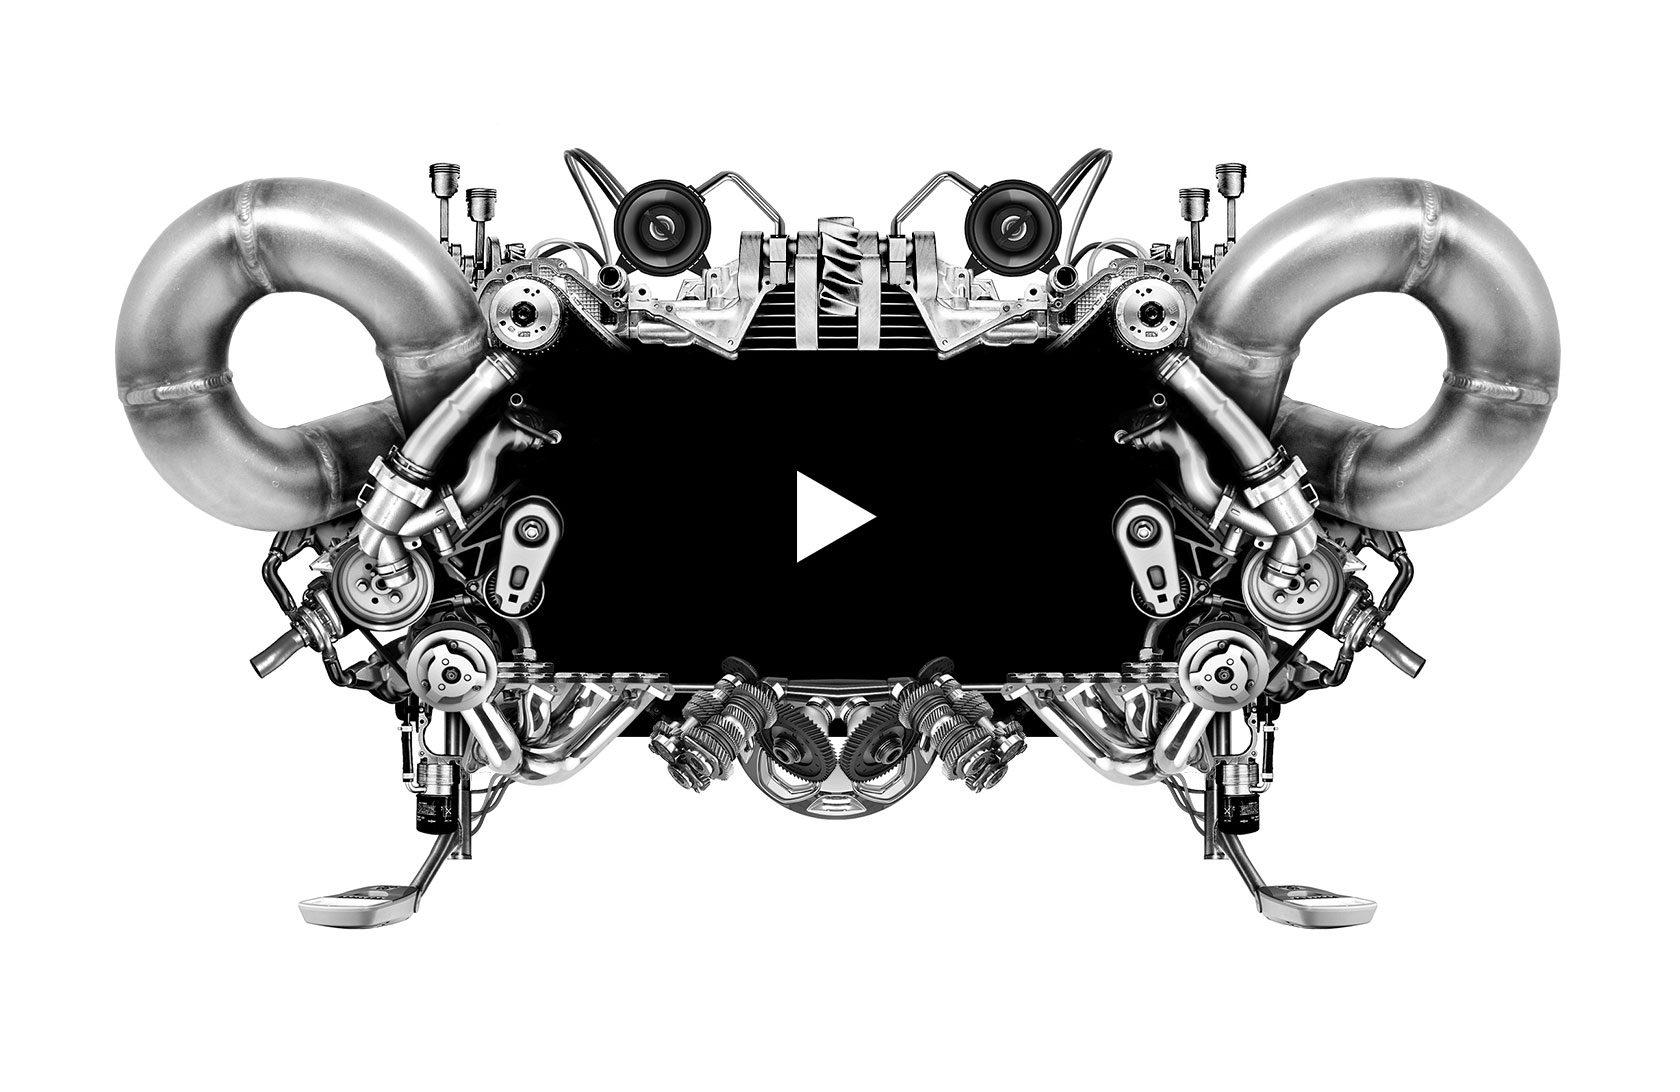 The Visual Medium Media Player Metal Design by Furia